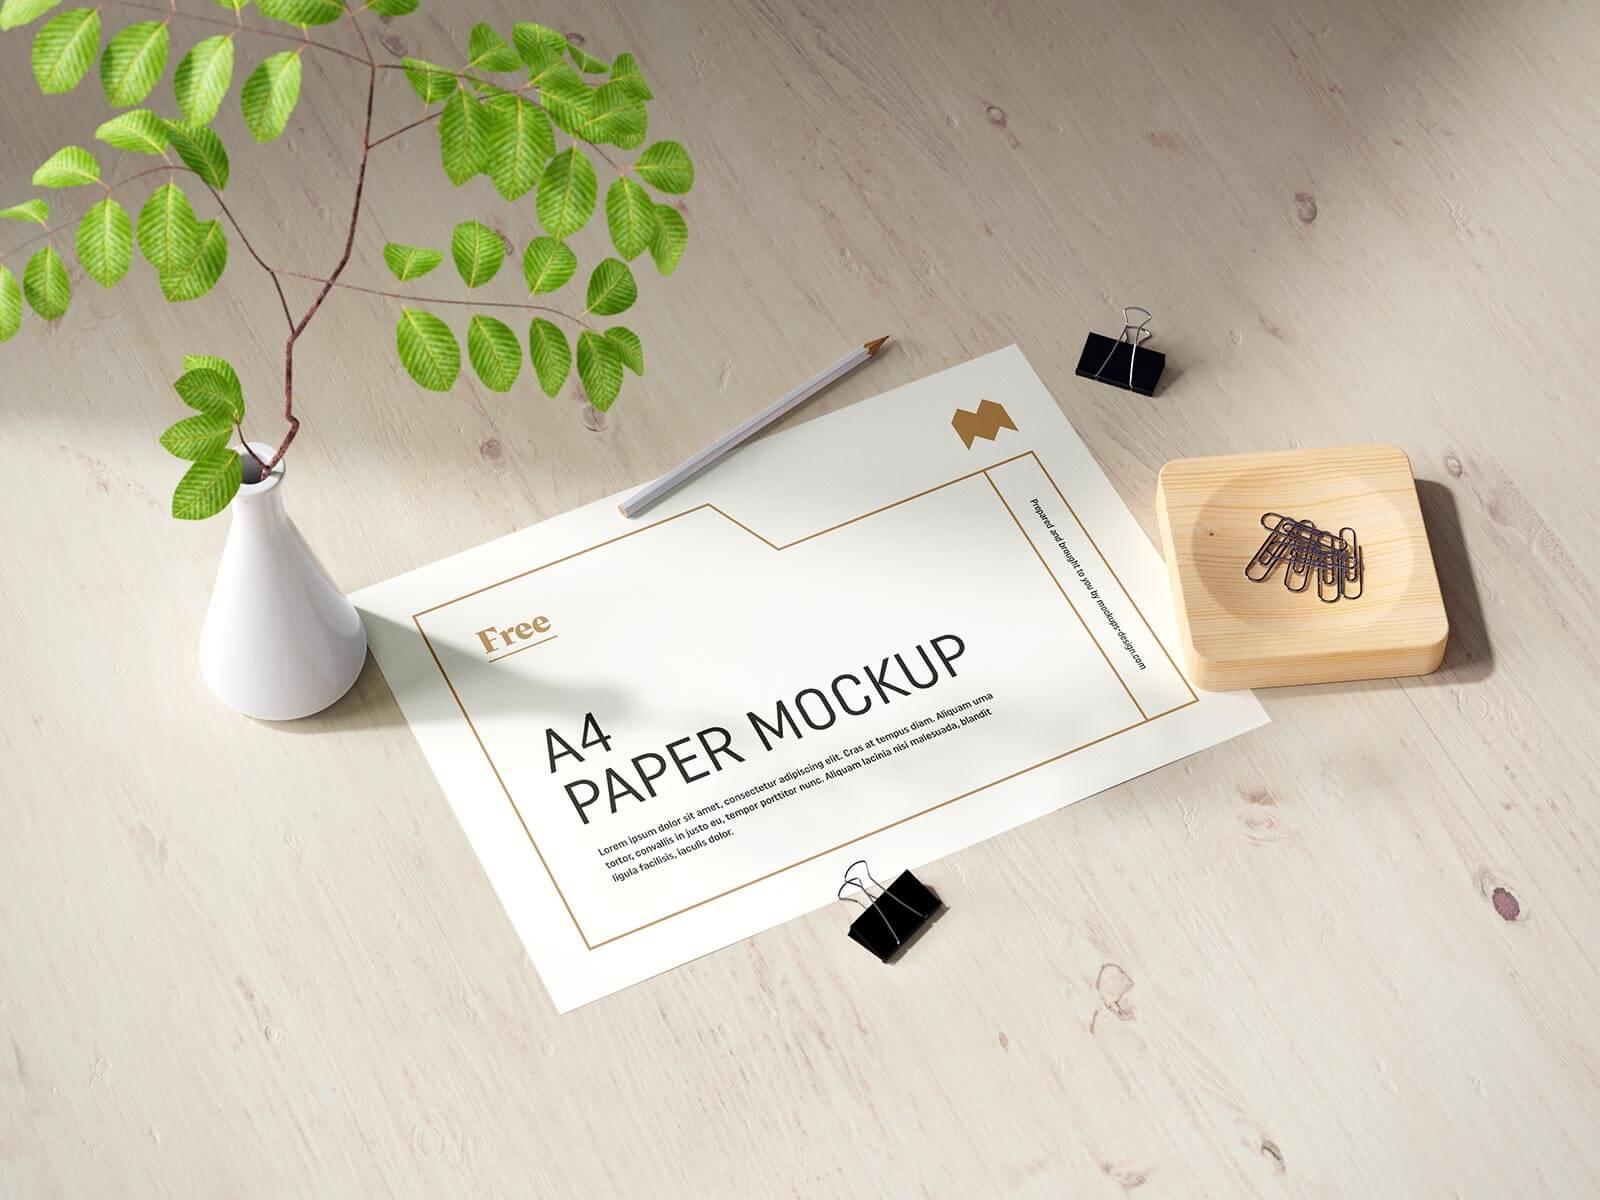 Free Vertical & Horizontal A4 Paper Flyer Letterhead Mockup PSD Set (3)